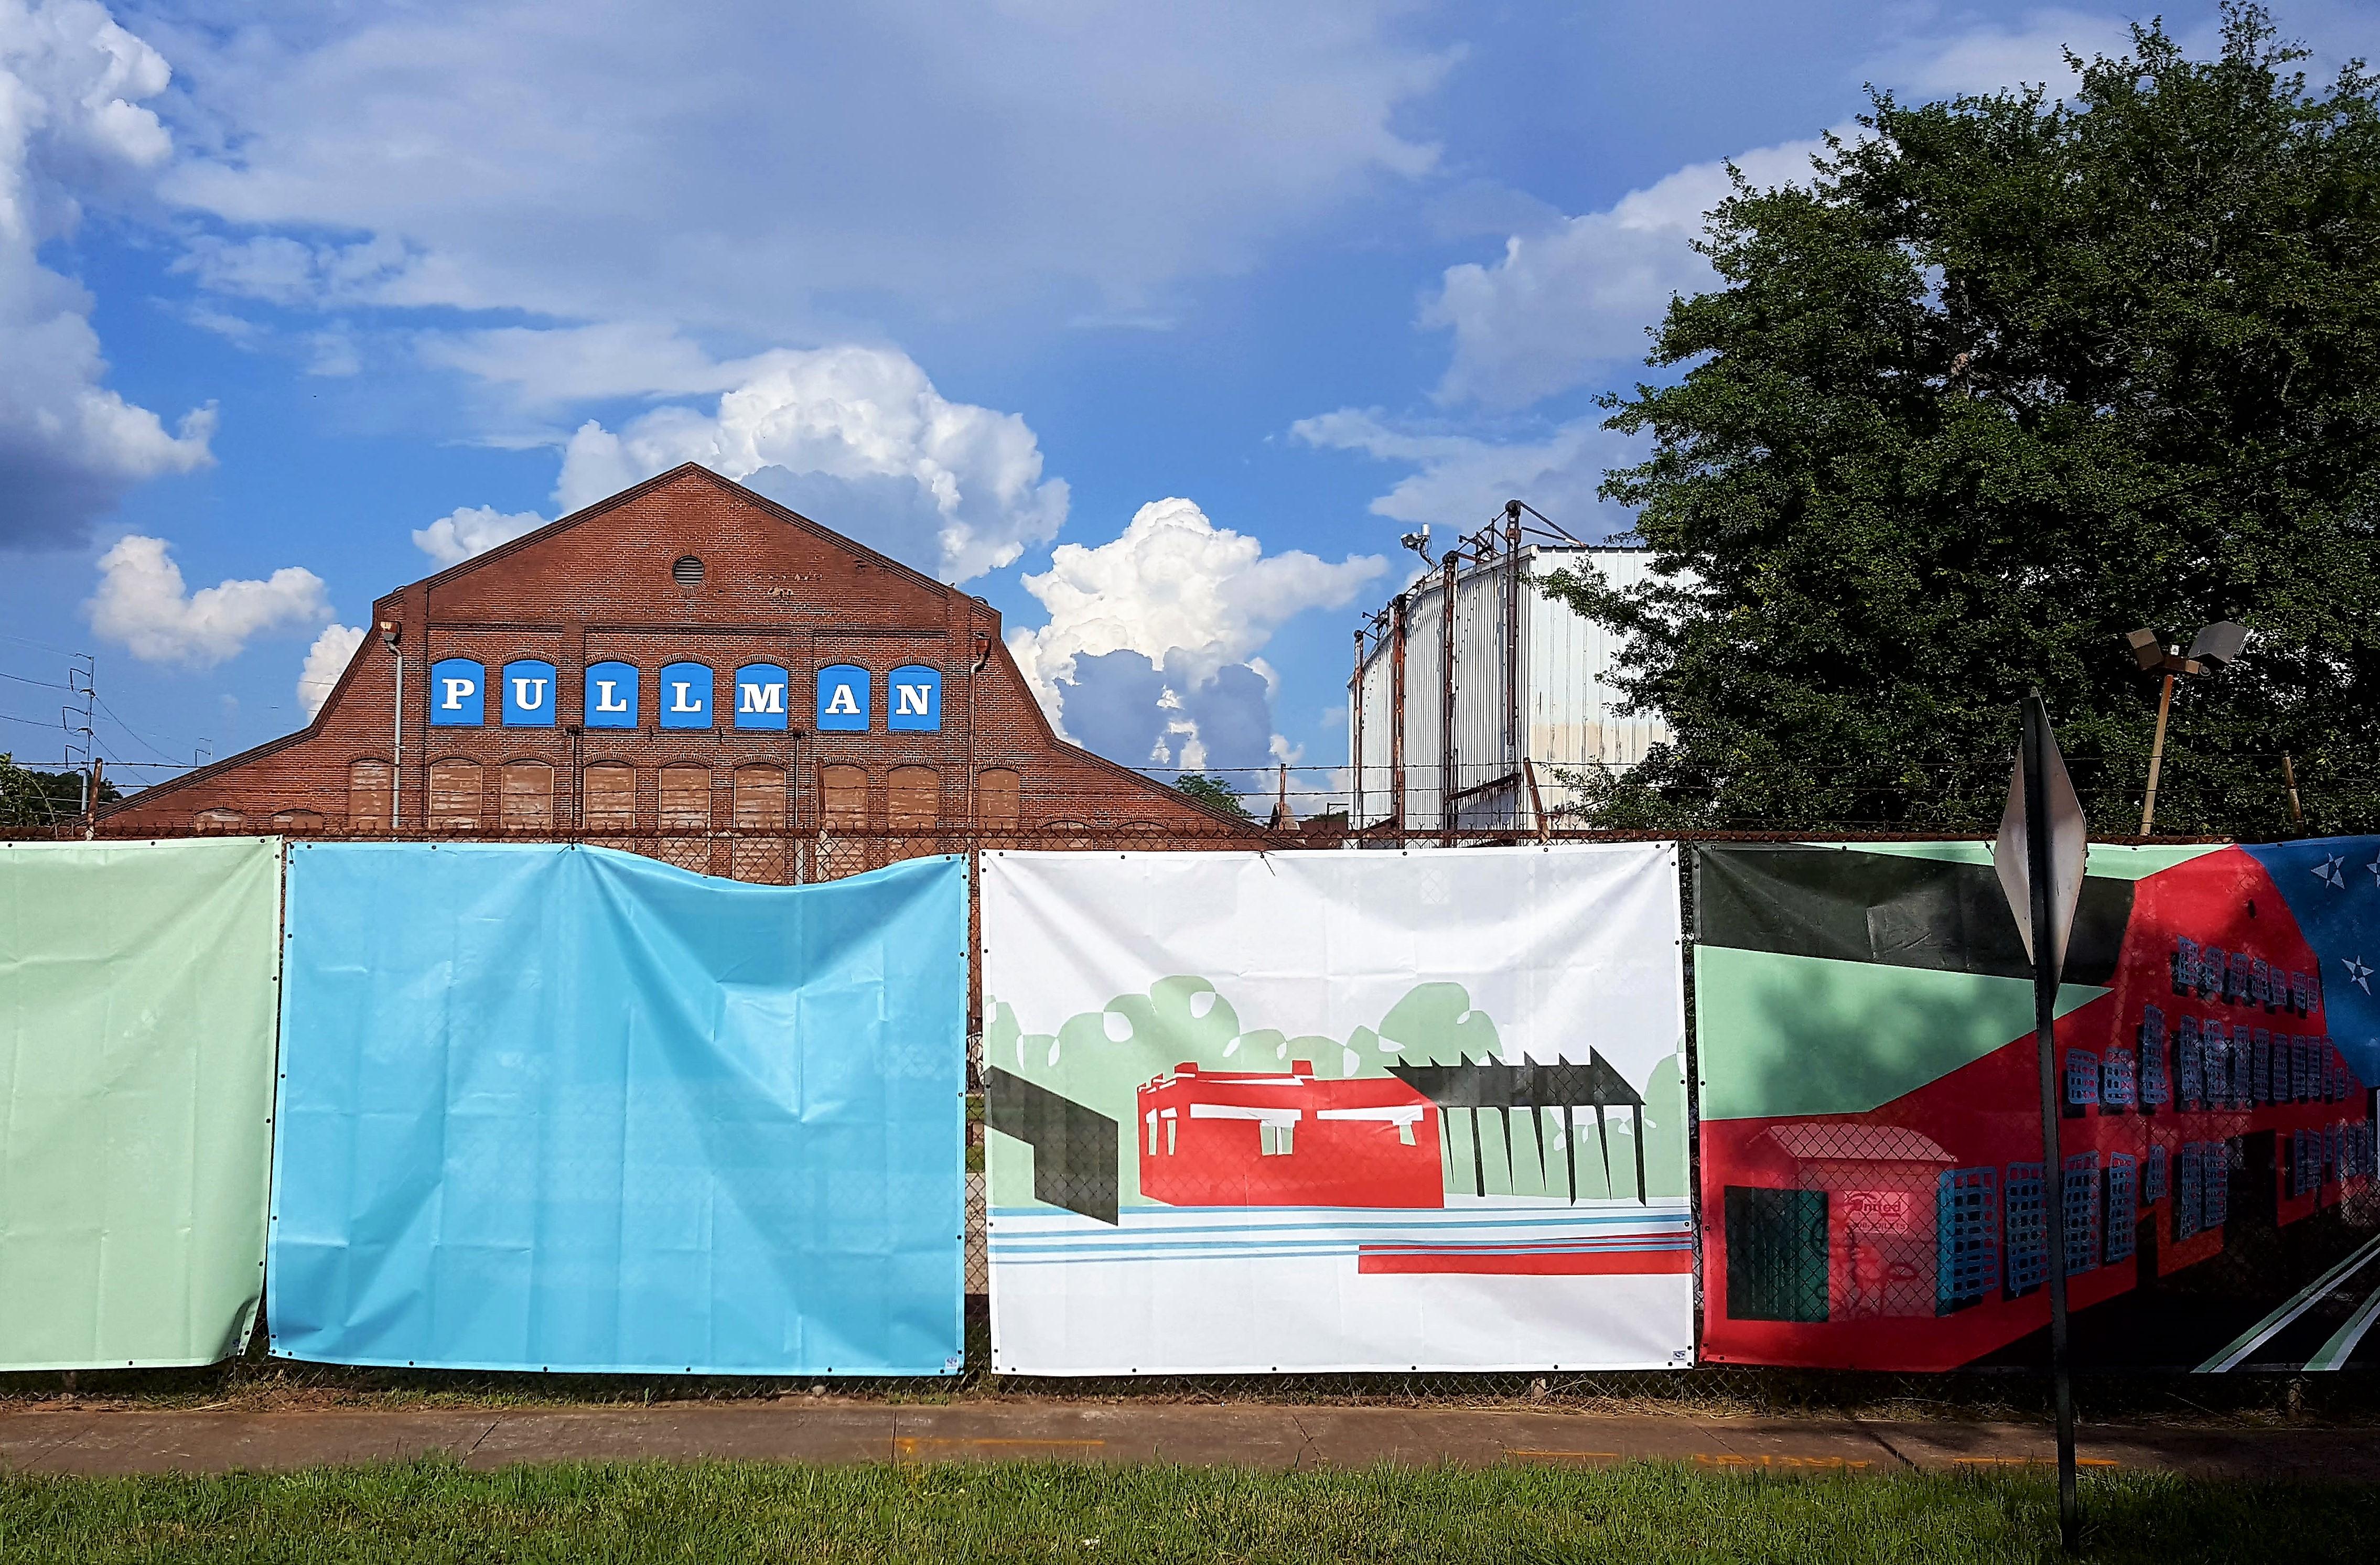 Developer: Pullman Yard, rechristened 'Pratt Pullman District,' to finally launch construction soon